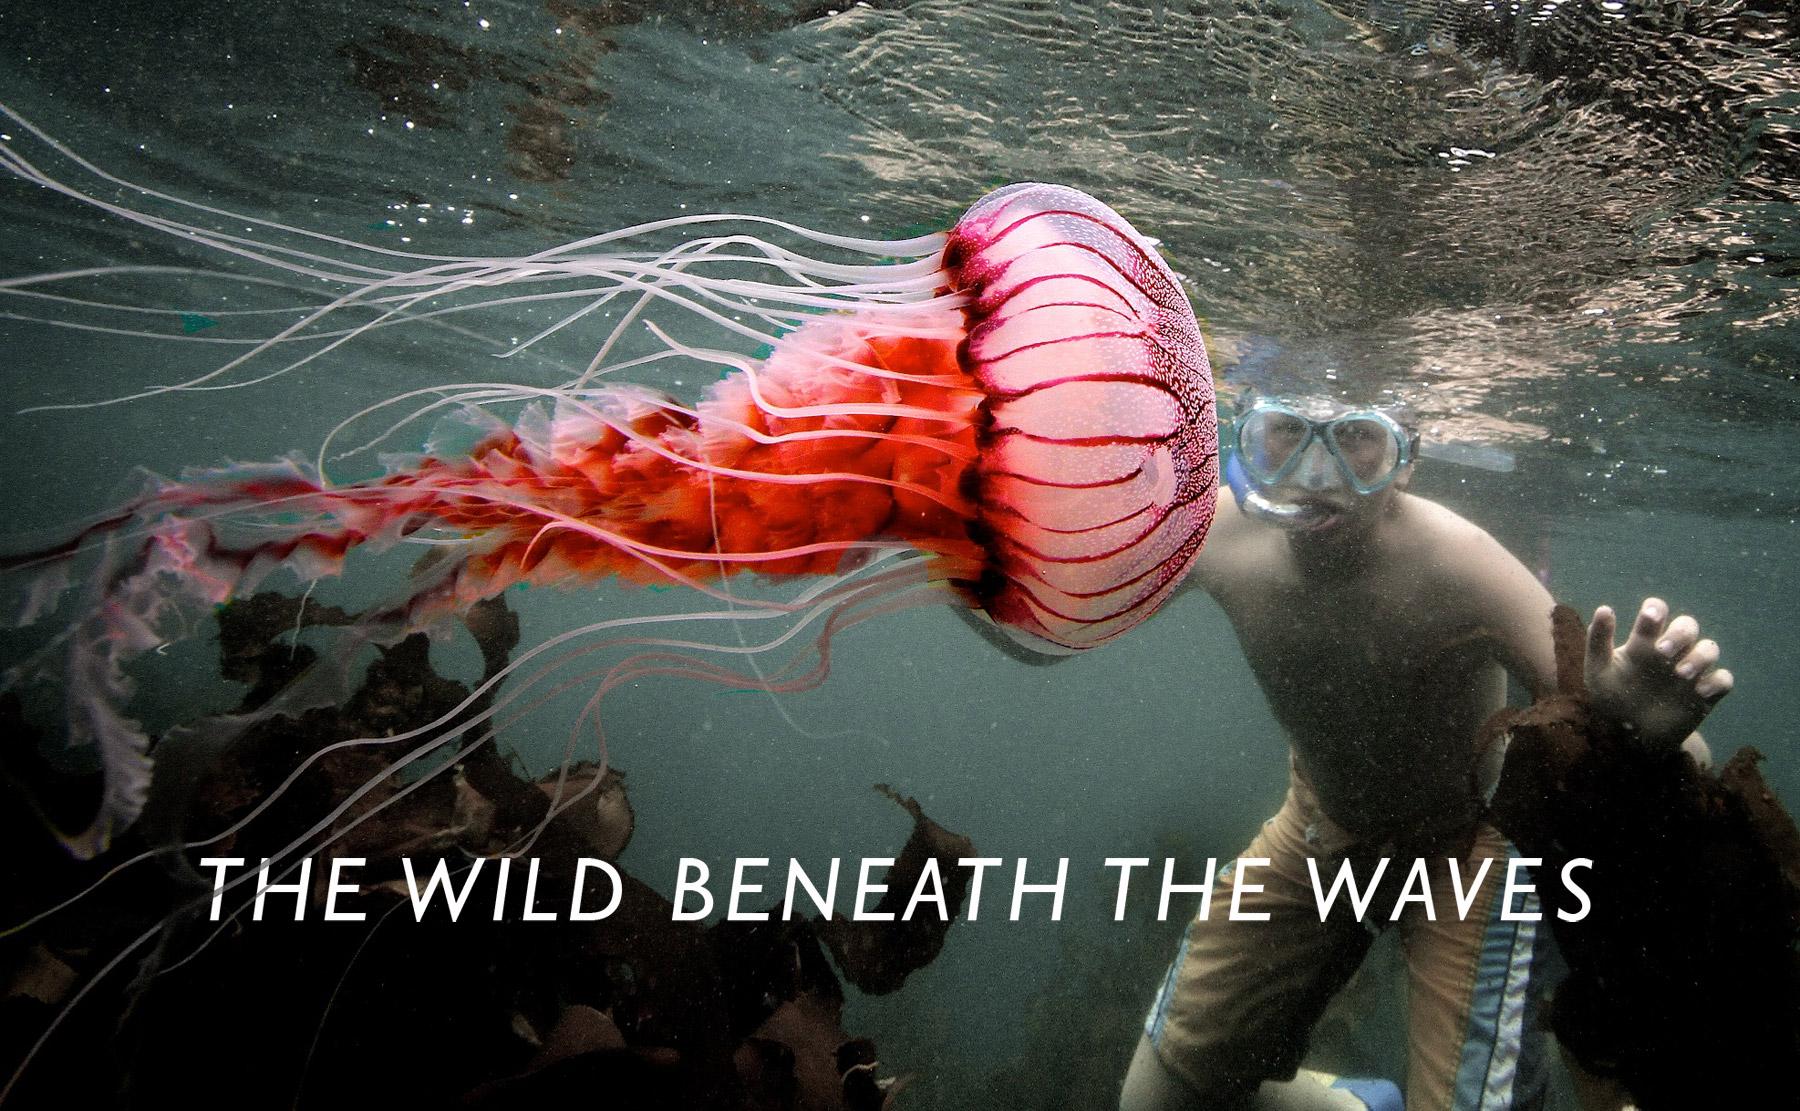 wild-beneath-waves-cover